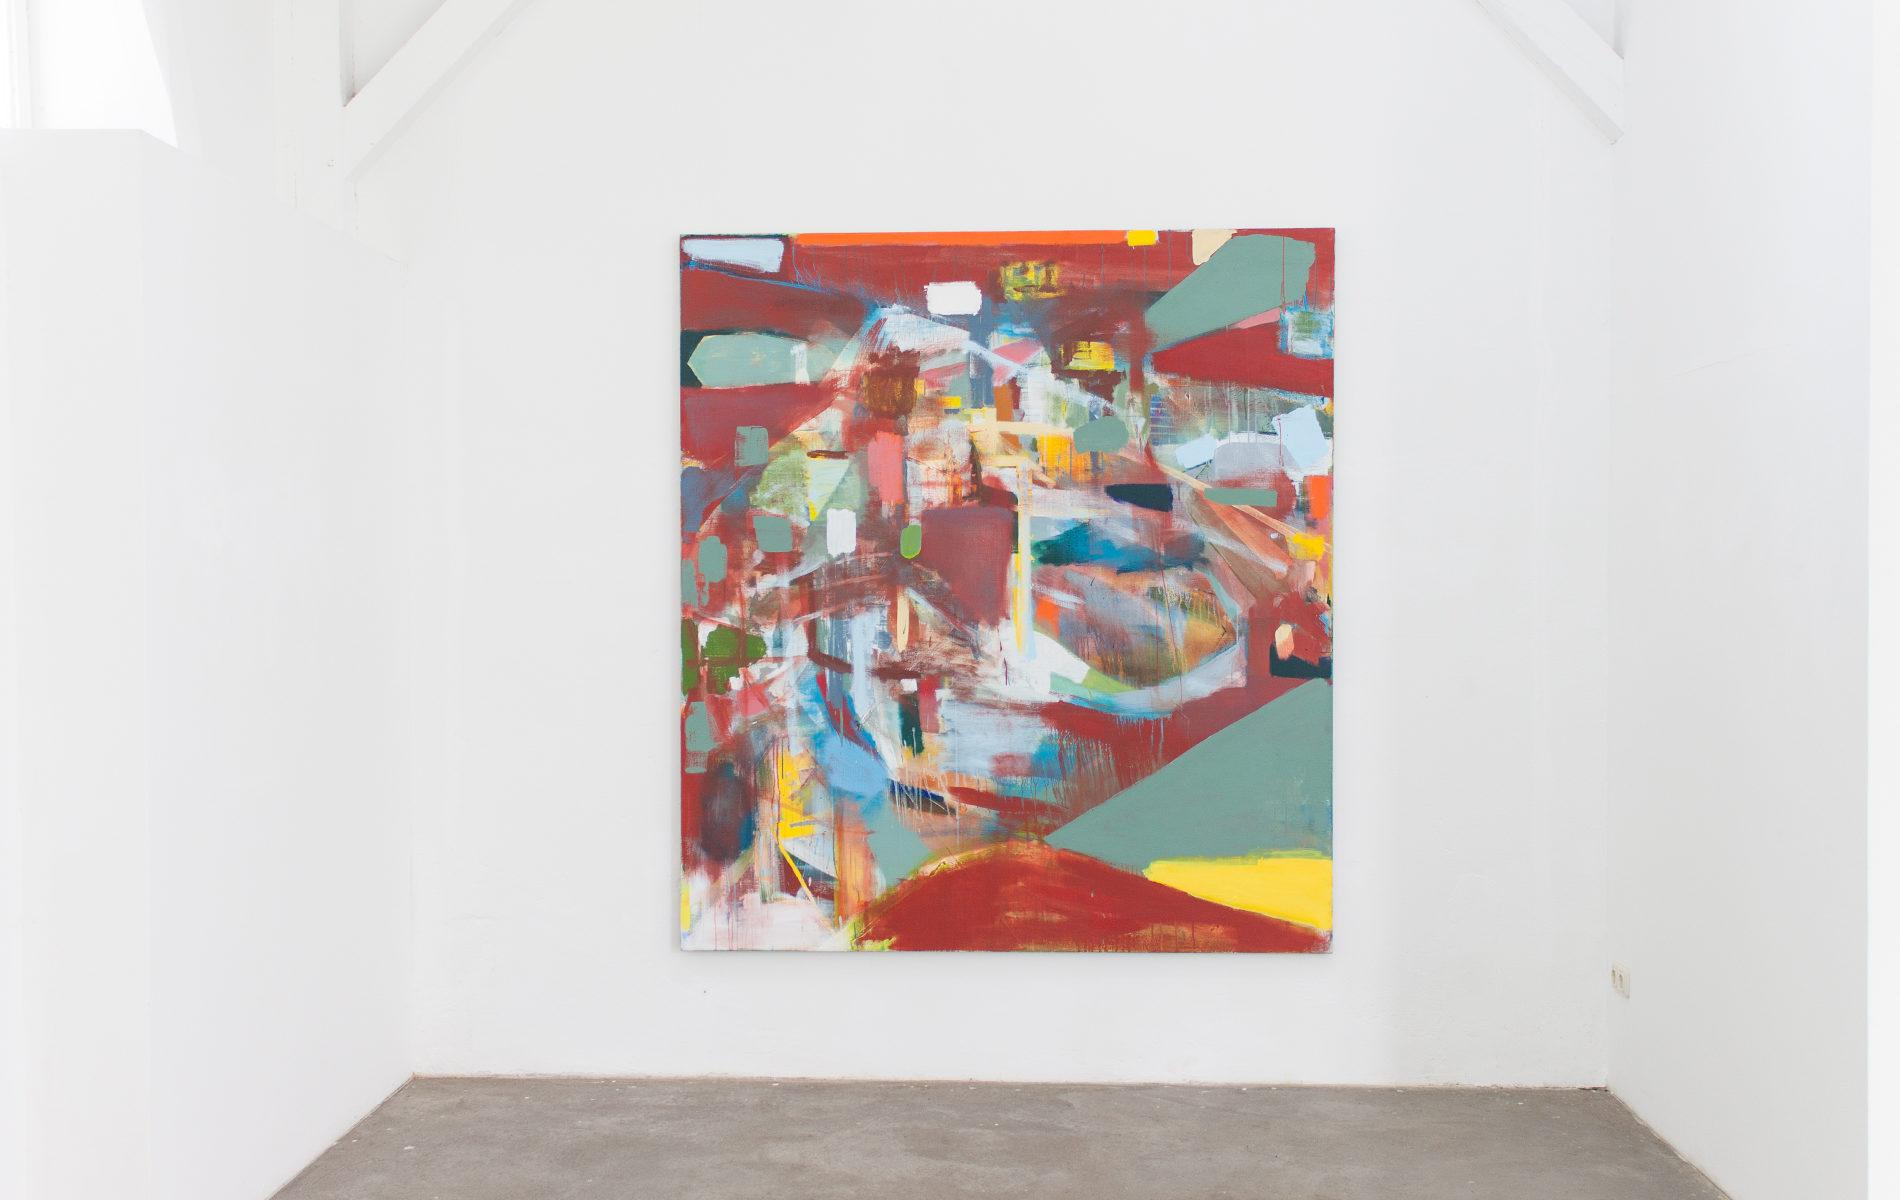 Galerie Born, Berlin. Michael Markwick; New Paintings 2017. Projektraum heiddorf